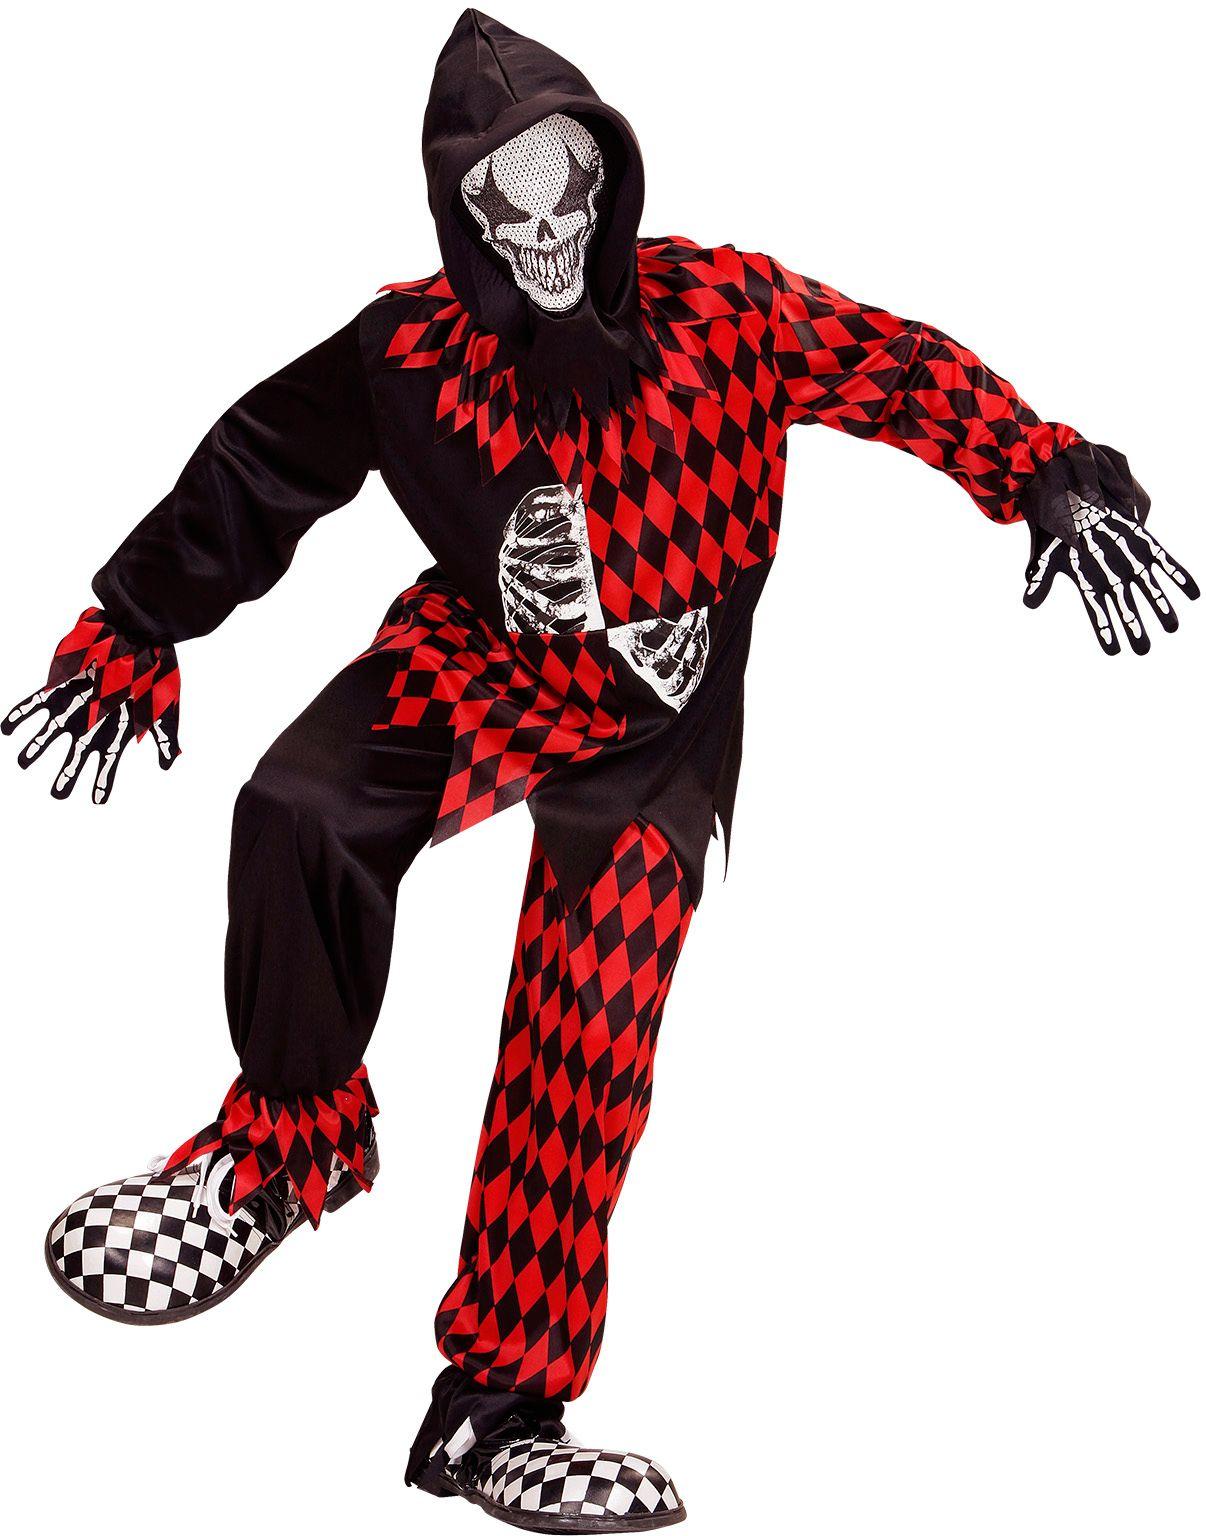 Halloween Verkleedkleding Kind.Halloween Kostuum Kopen De Goedkoopste Carnavalskleding Nl